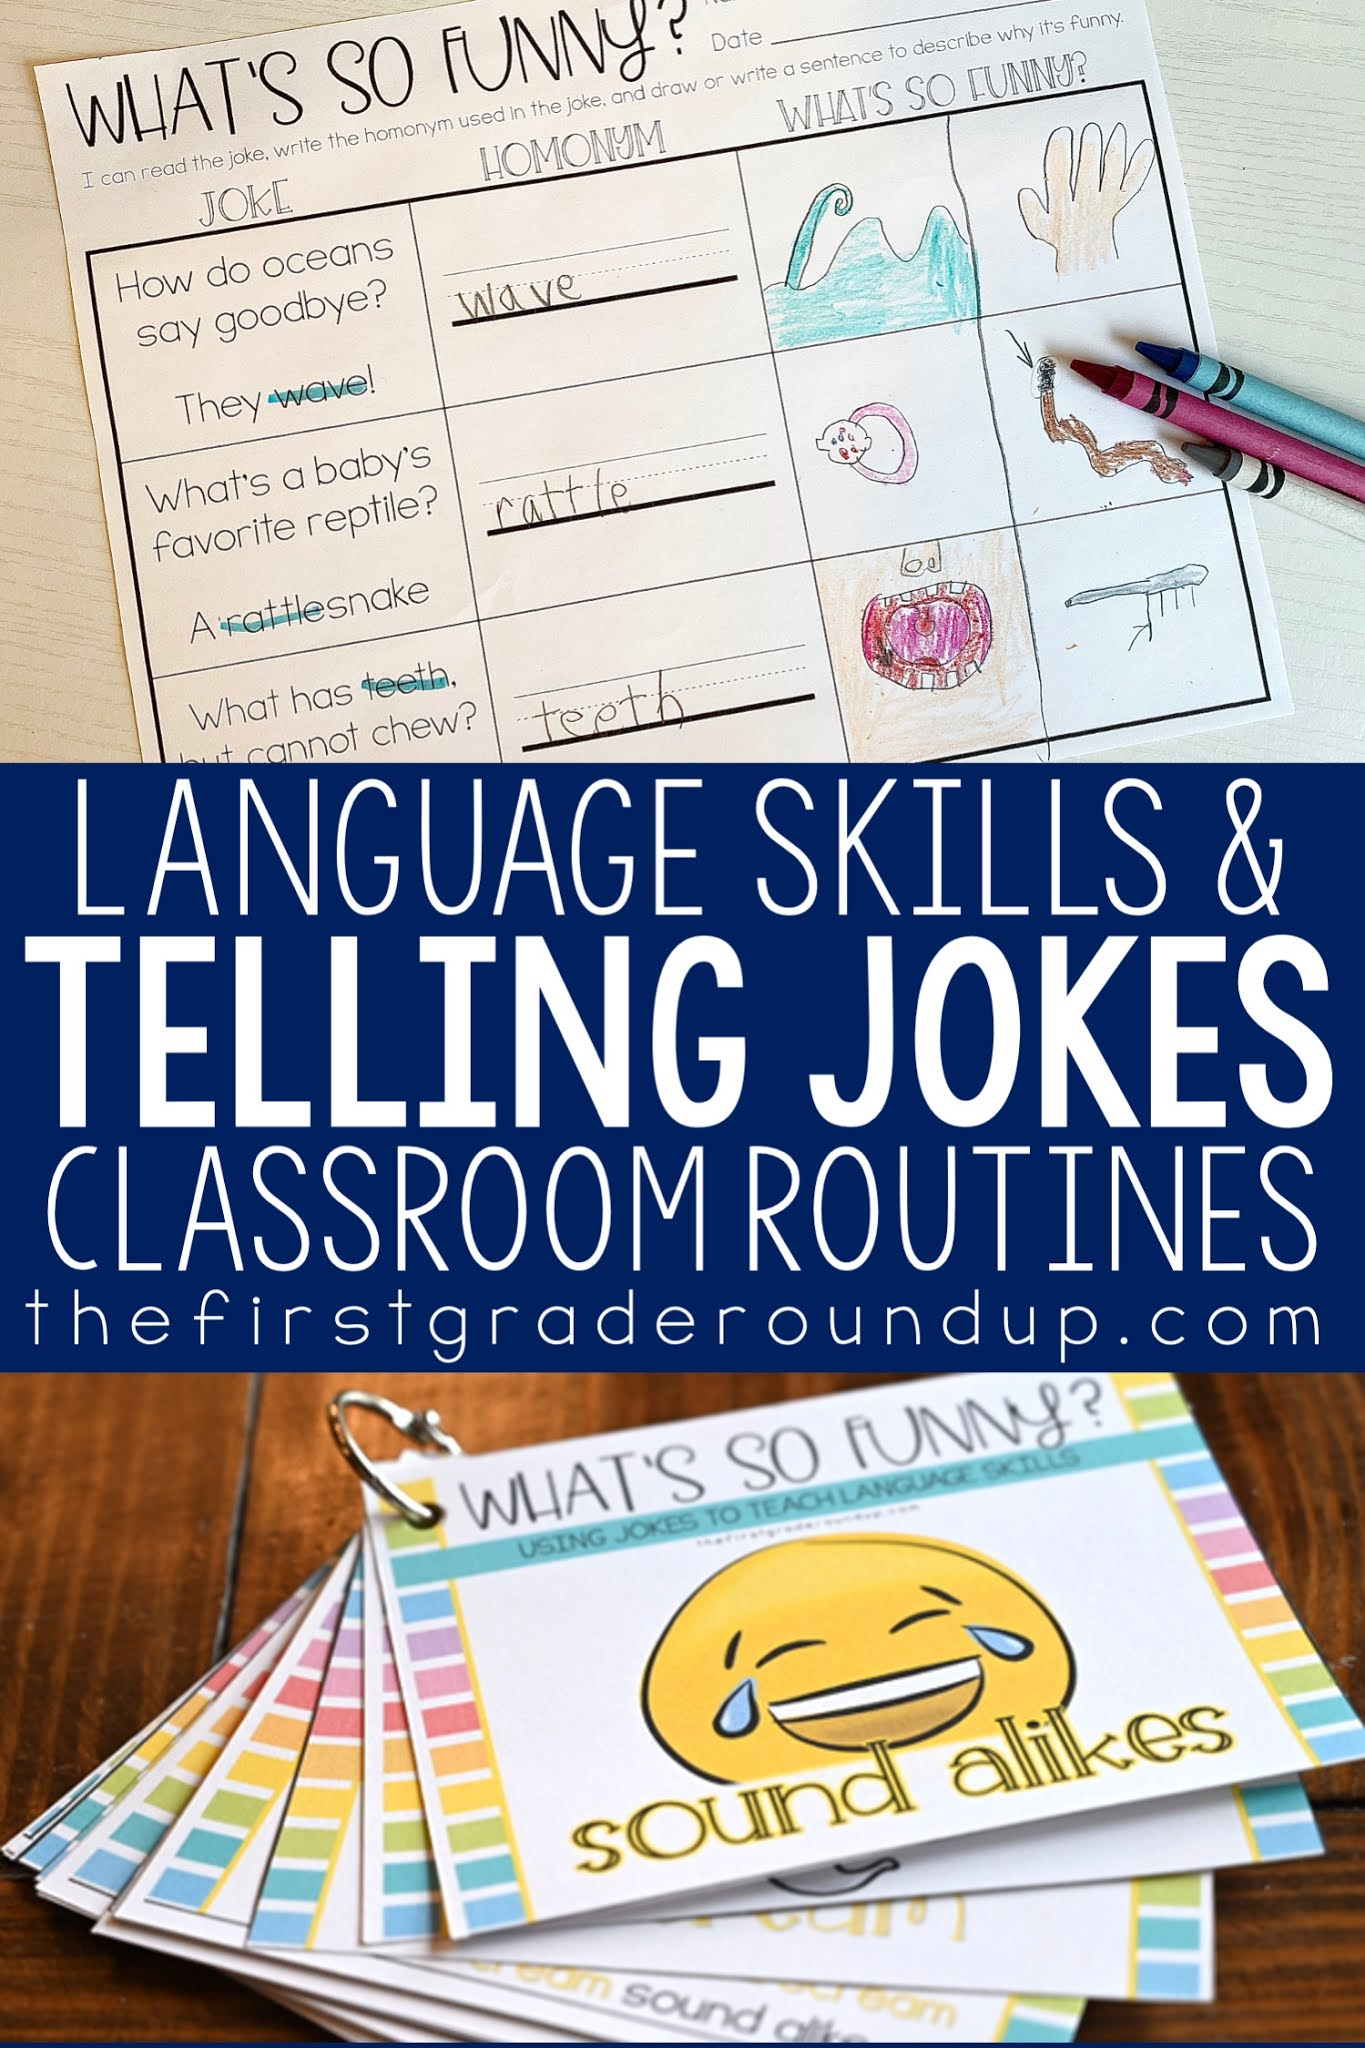 Using Jokes to Teach Language Skills - Firstgraderoundup